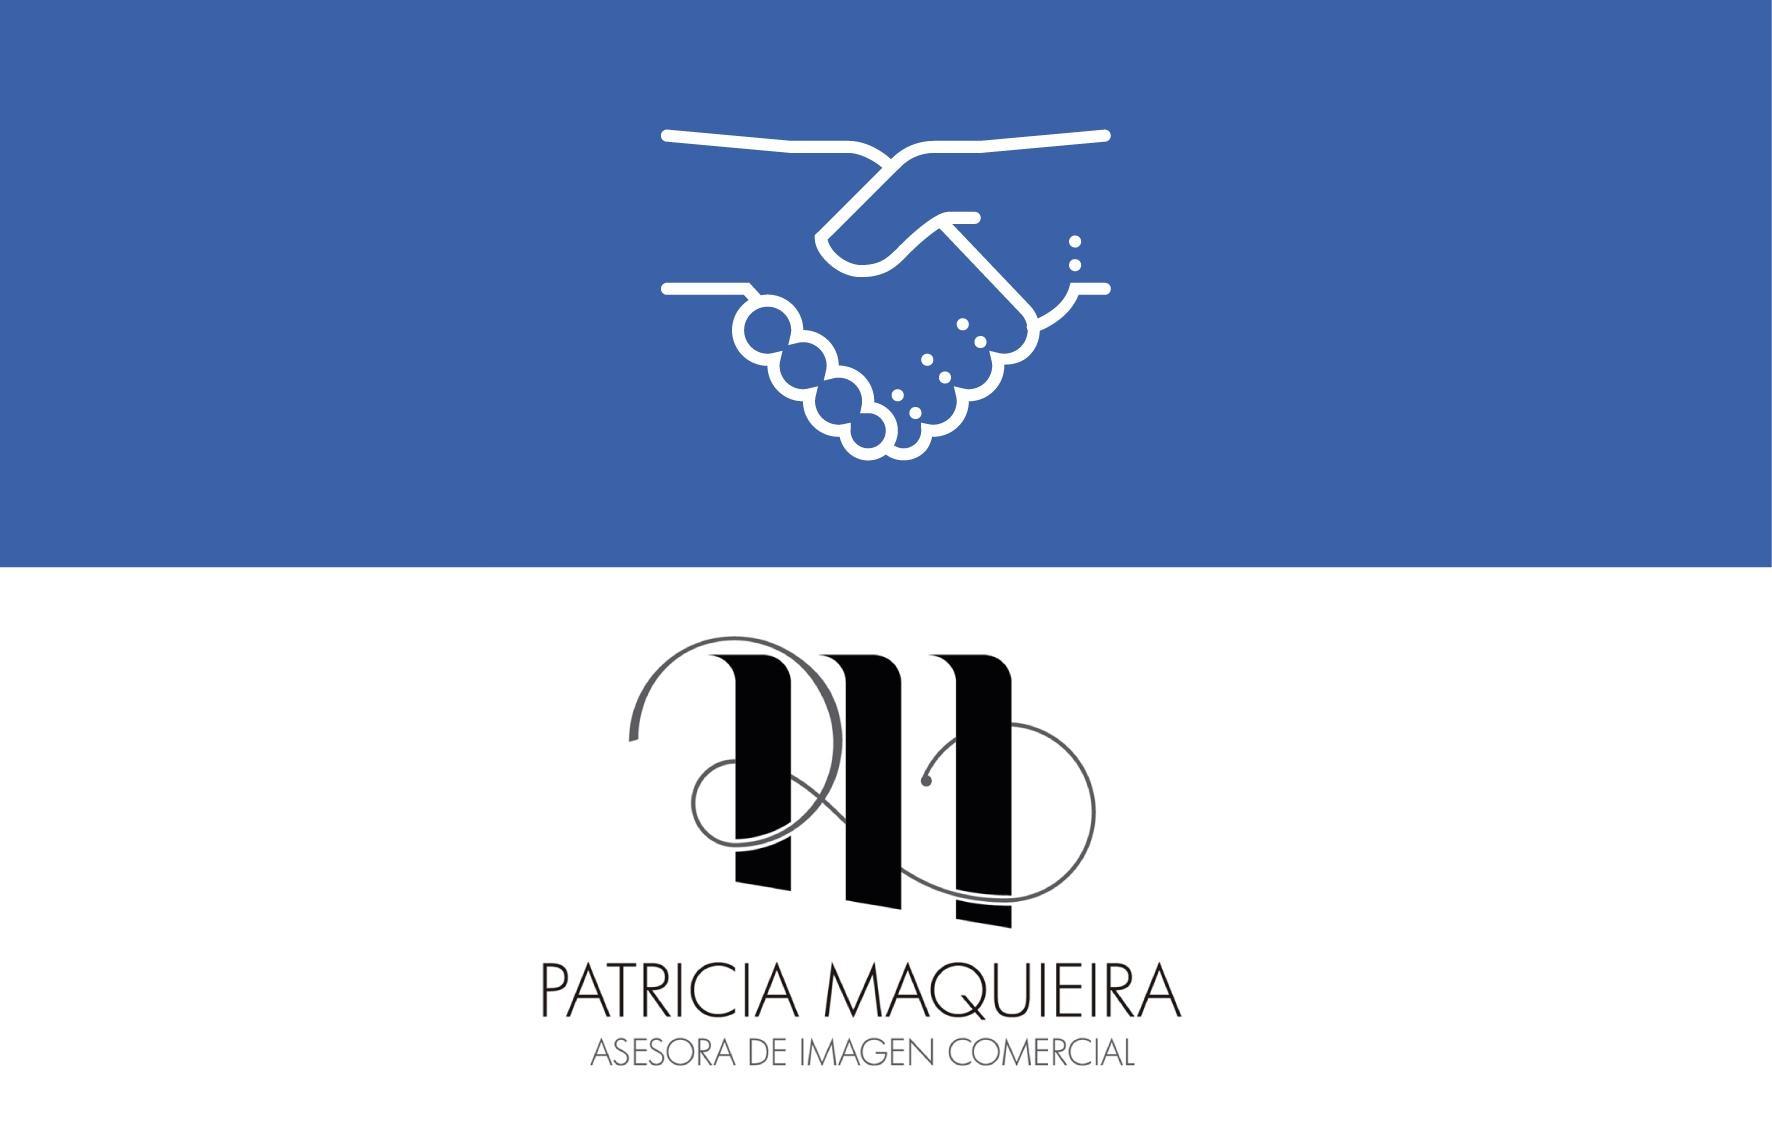 CONVENIO  PATRICIA MAQUIEITA